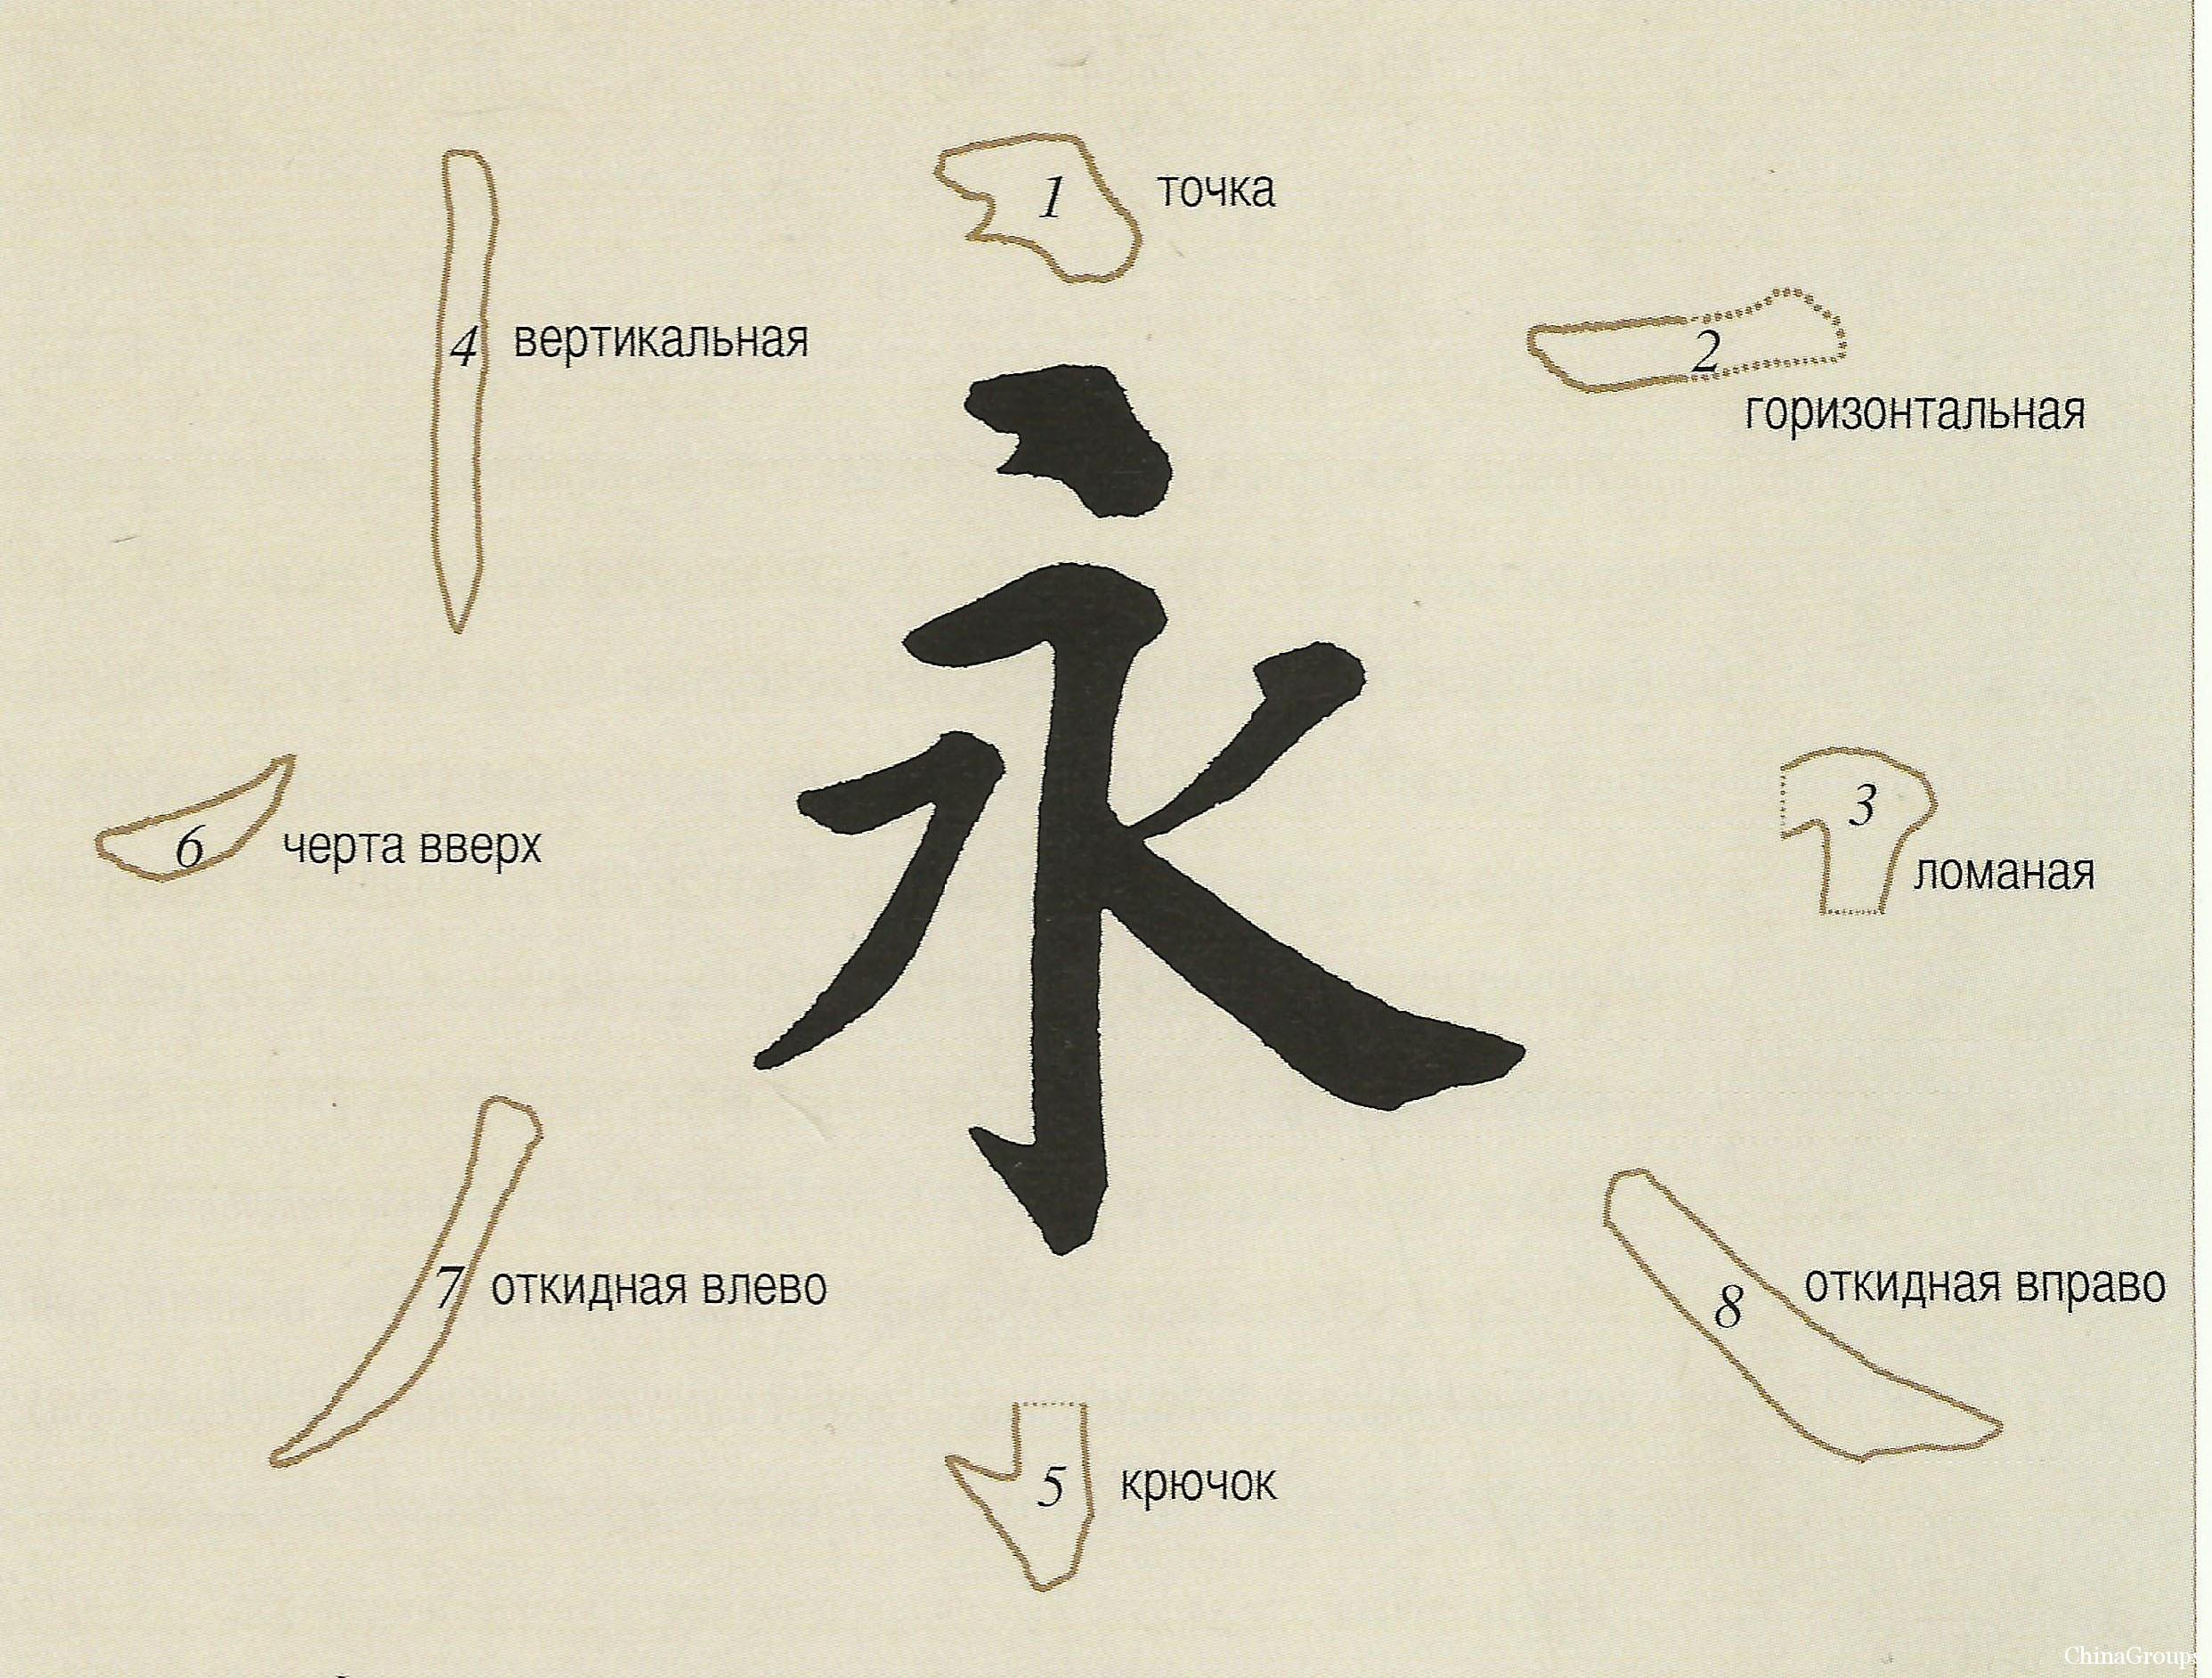 Картинки и значение японских иероглифов на русский